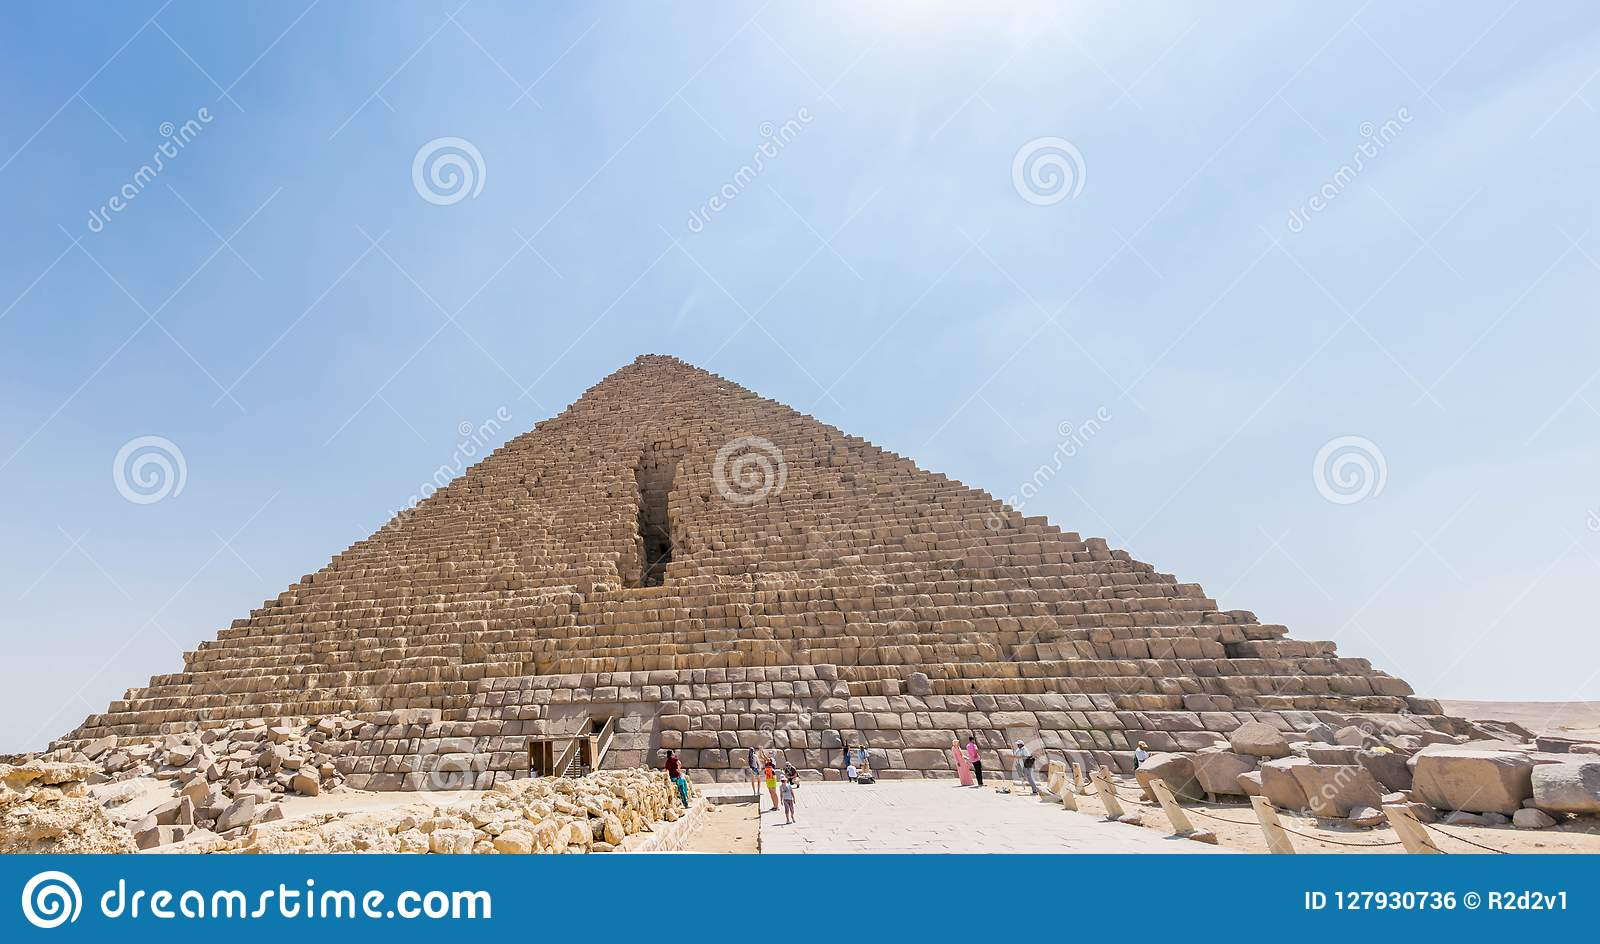 Пирамида Menkaure в Египте